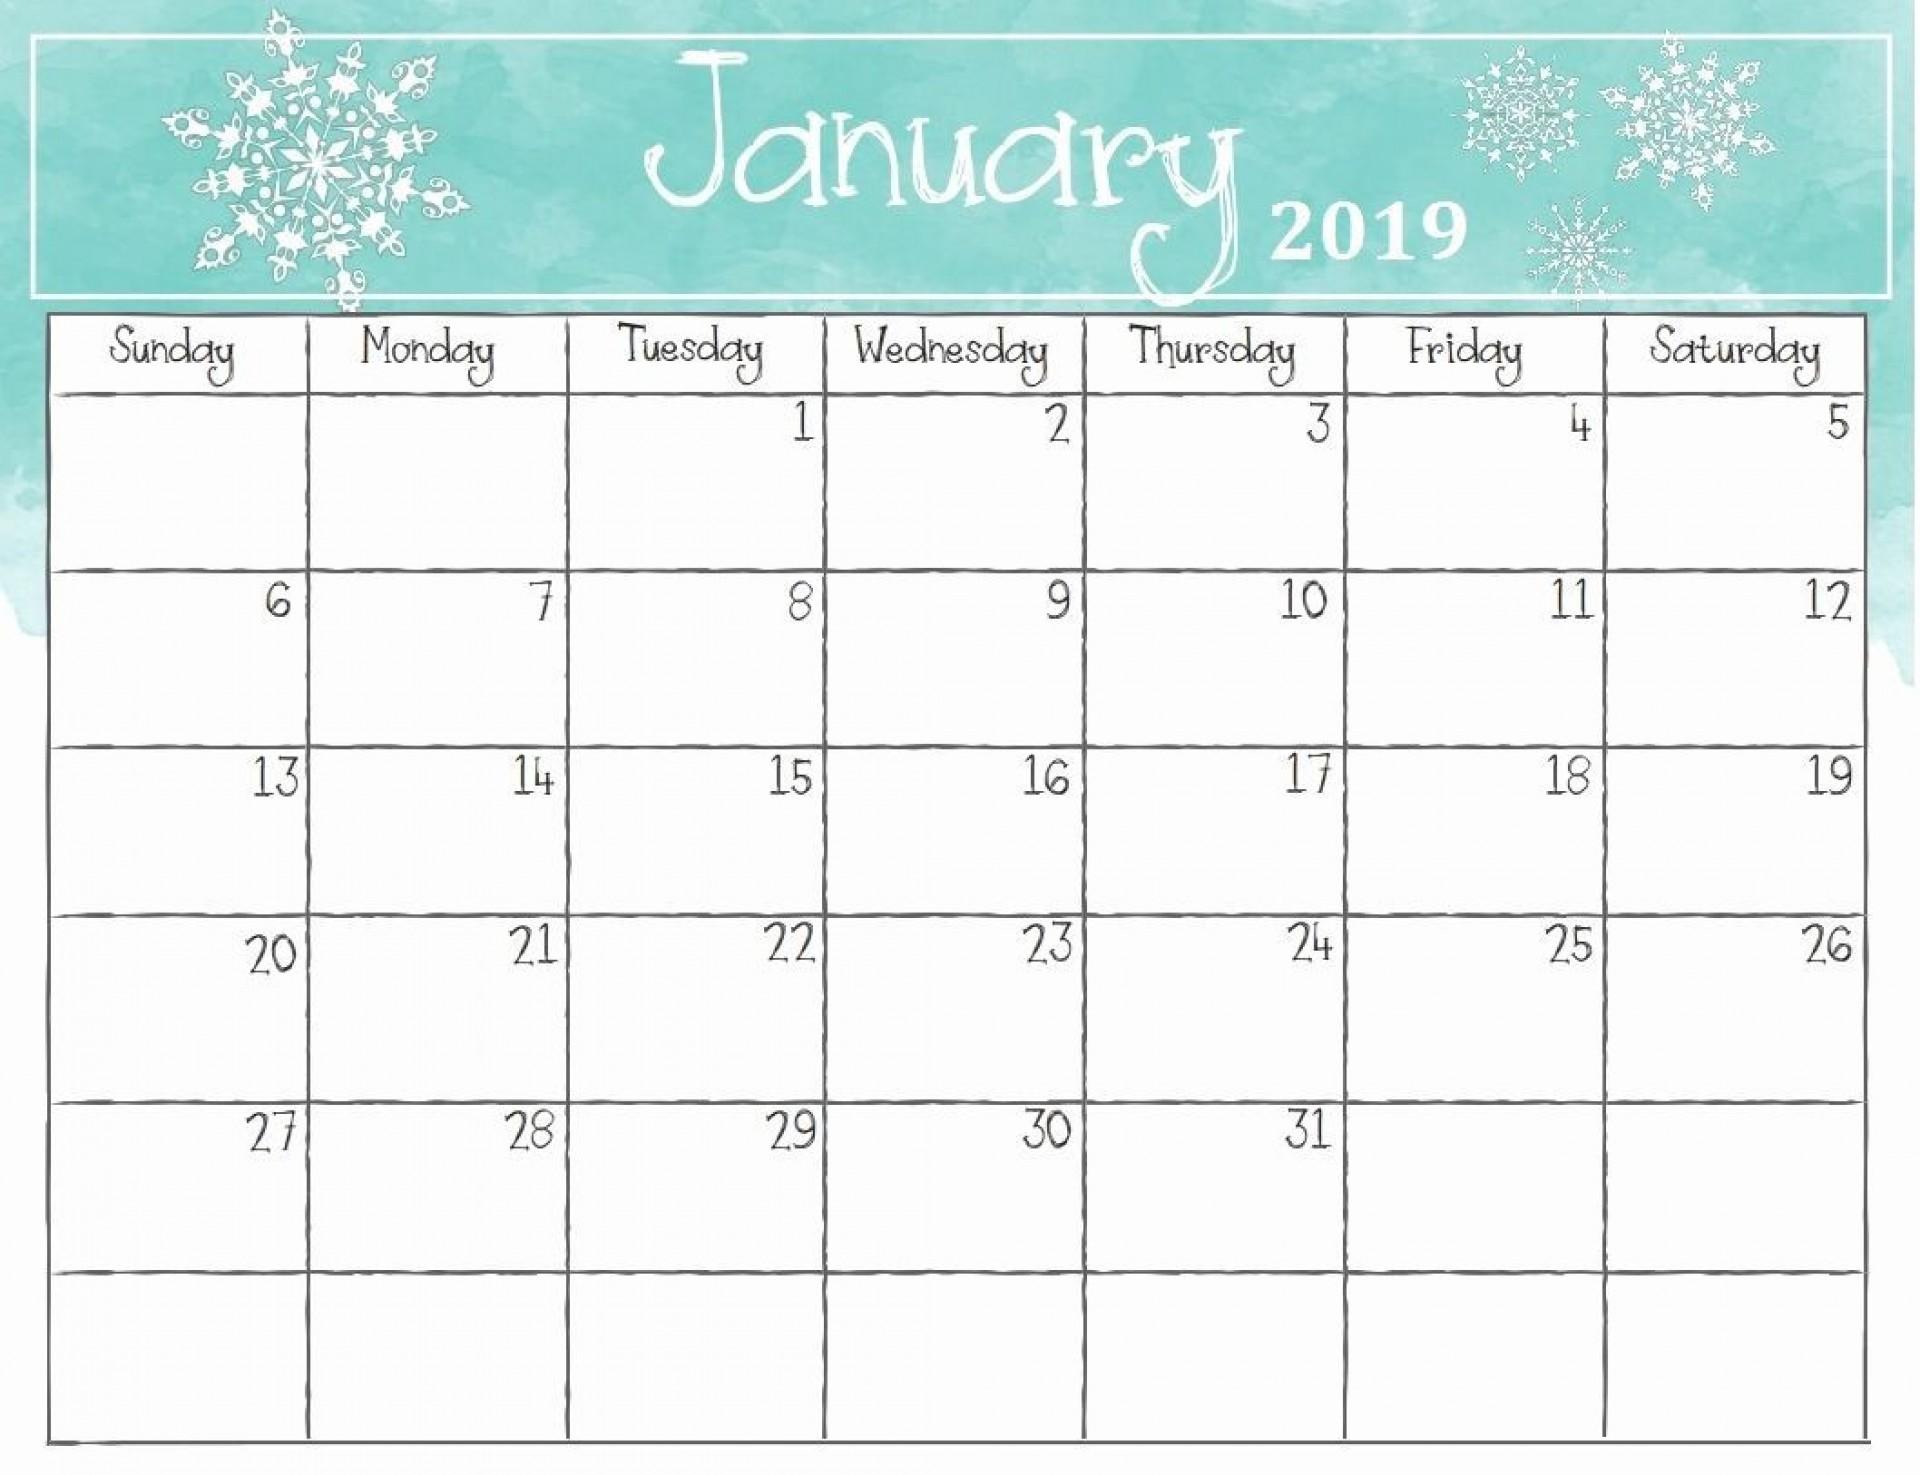 002 Beautiful Calendar Template For Word 2010 Image  2019 Microsoft1920